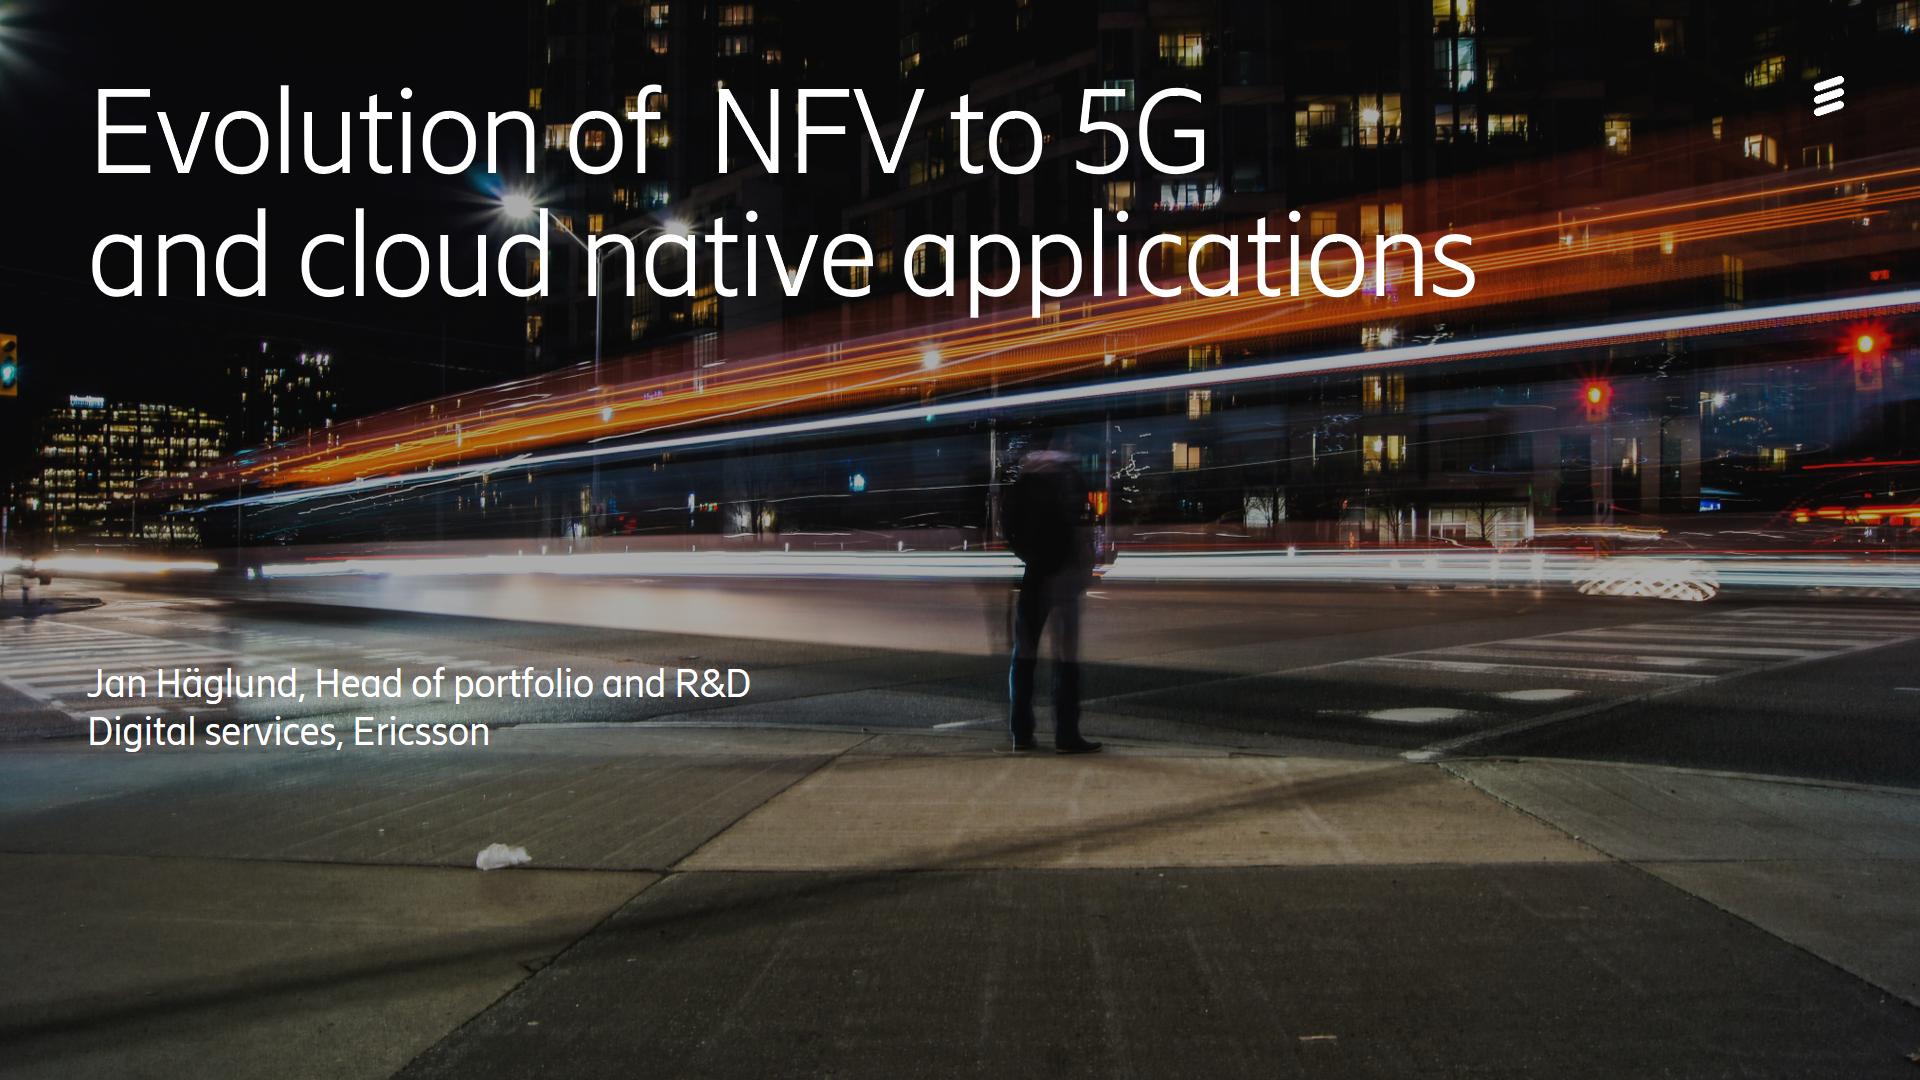 Evolution of NFVi for cloud native applications